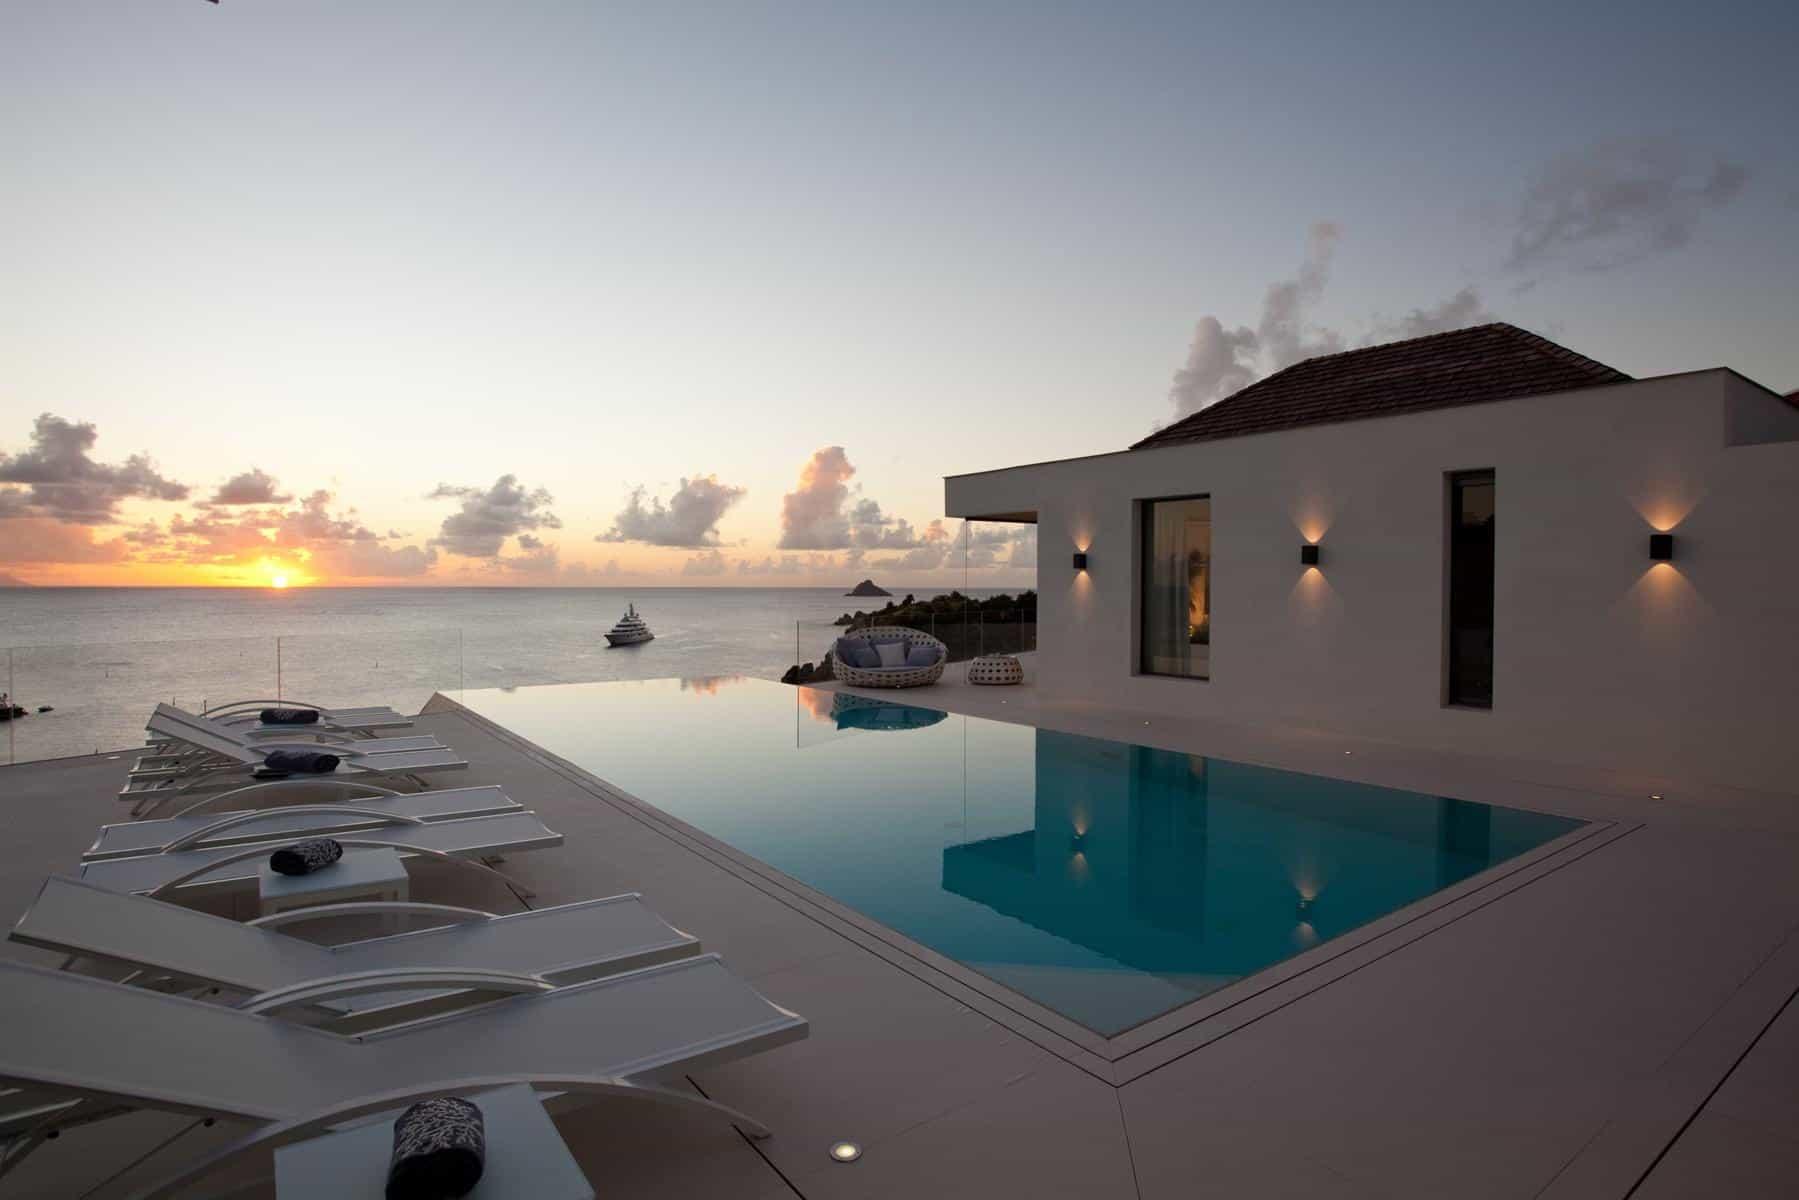 Luxury villas with infinity edge pools rental escapes for Villas with infinity pools